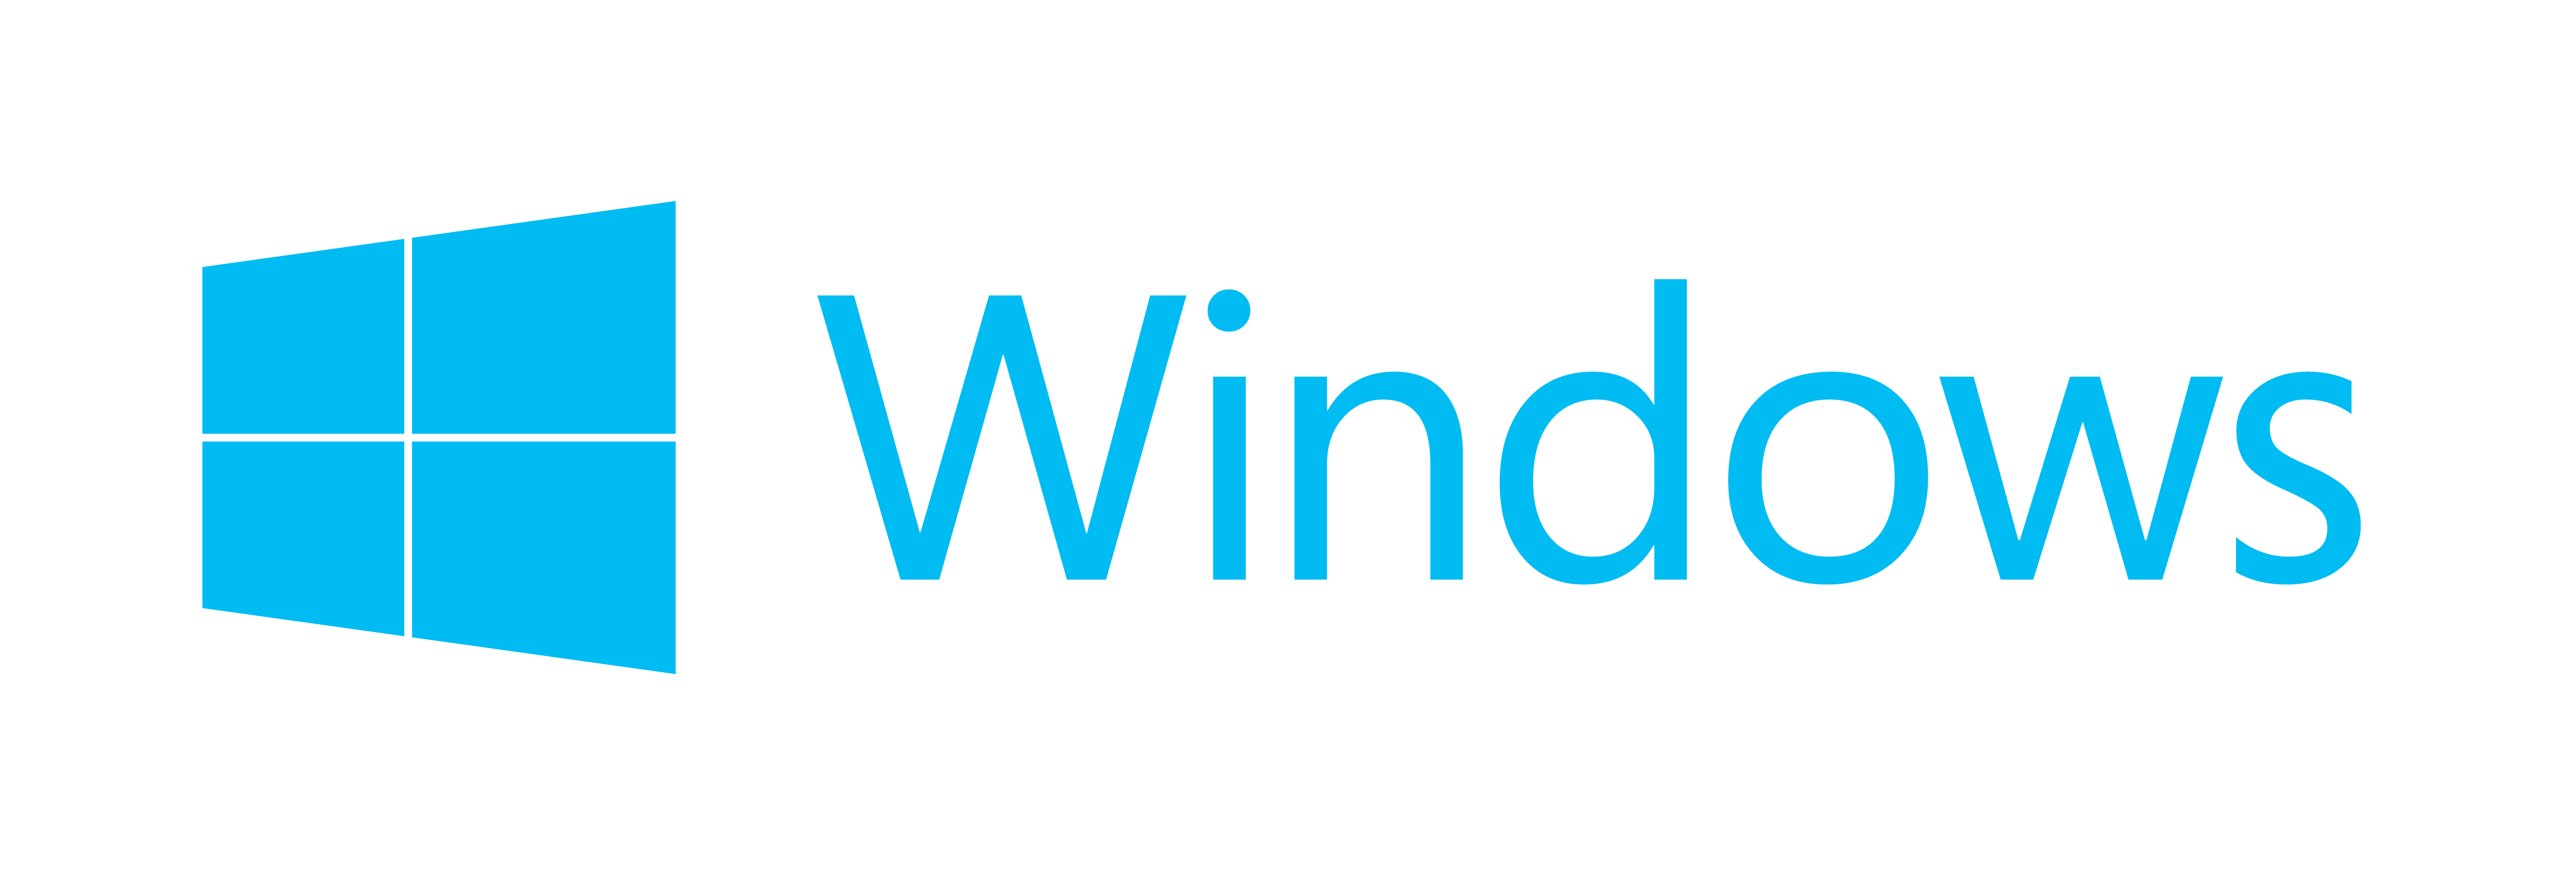 Windows 10 background clipart.